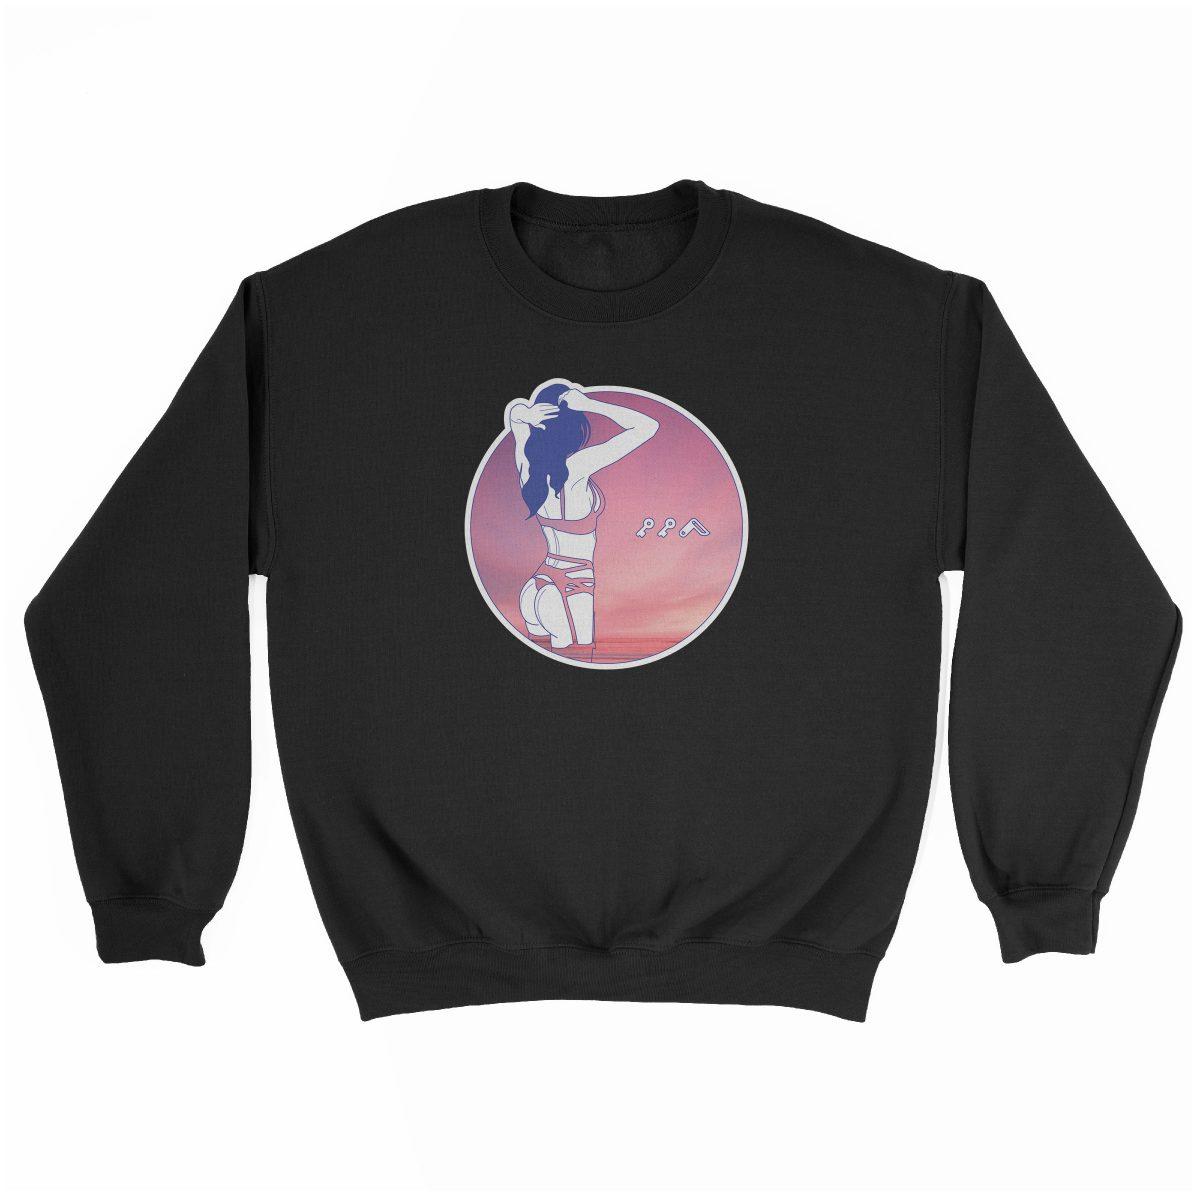 """NIGHT MOVES"" music festival beach sweatshirt in black"